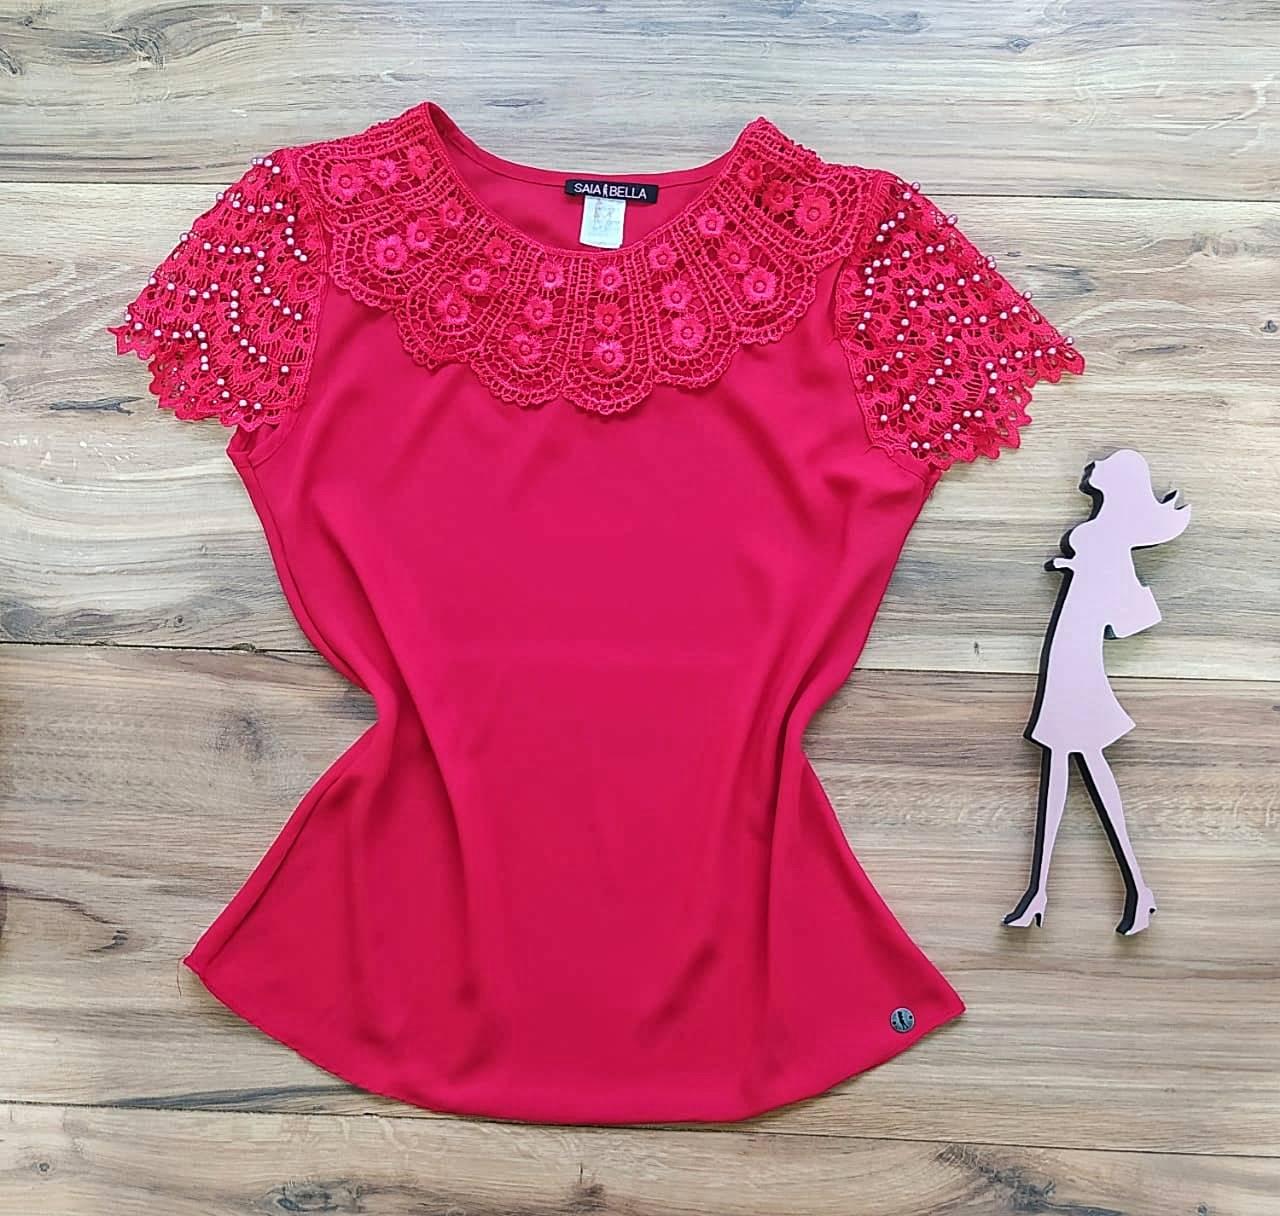 Blusa Fiorella de Renda Saia Bella - SB79902 Vermelho